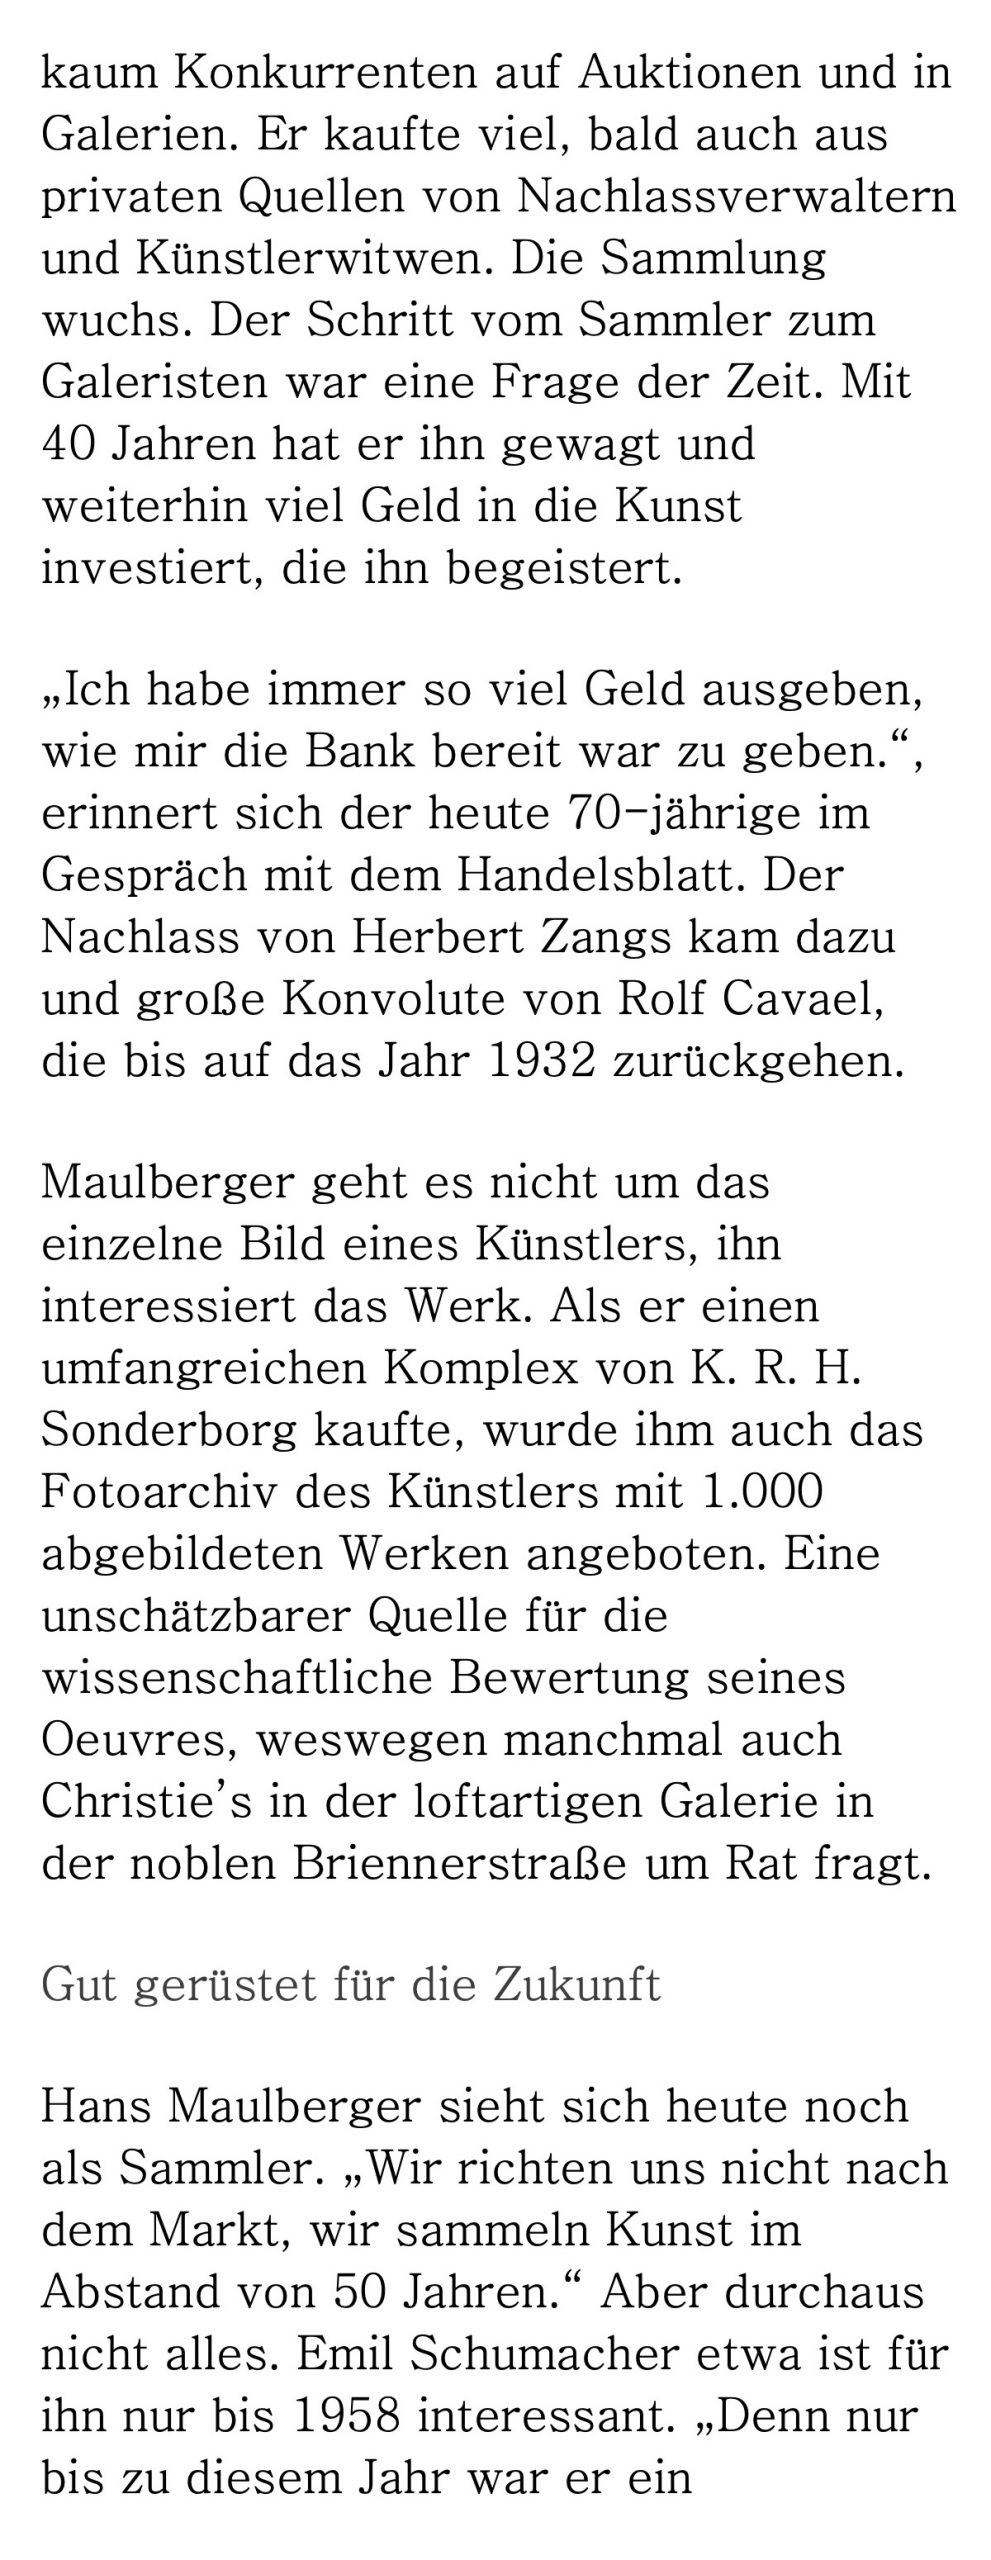 Presse Galerie Maulberger Handelsblatt 2014 04